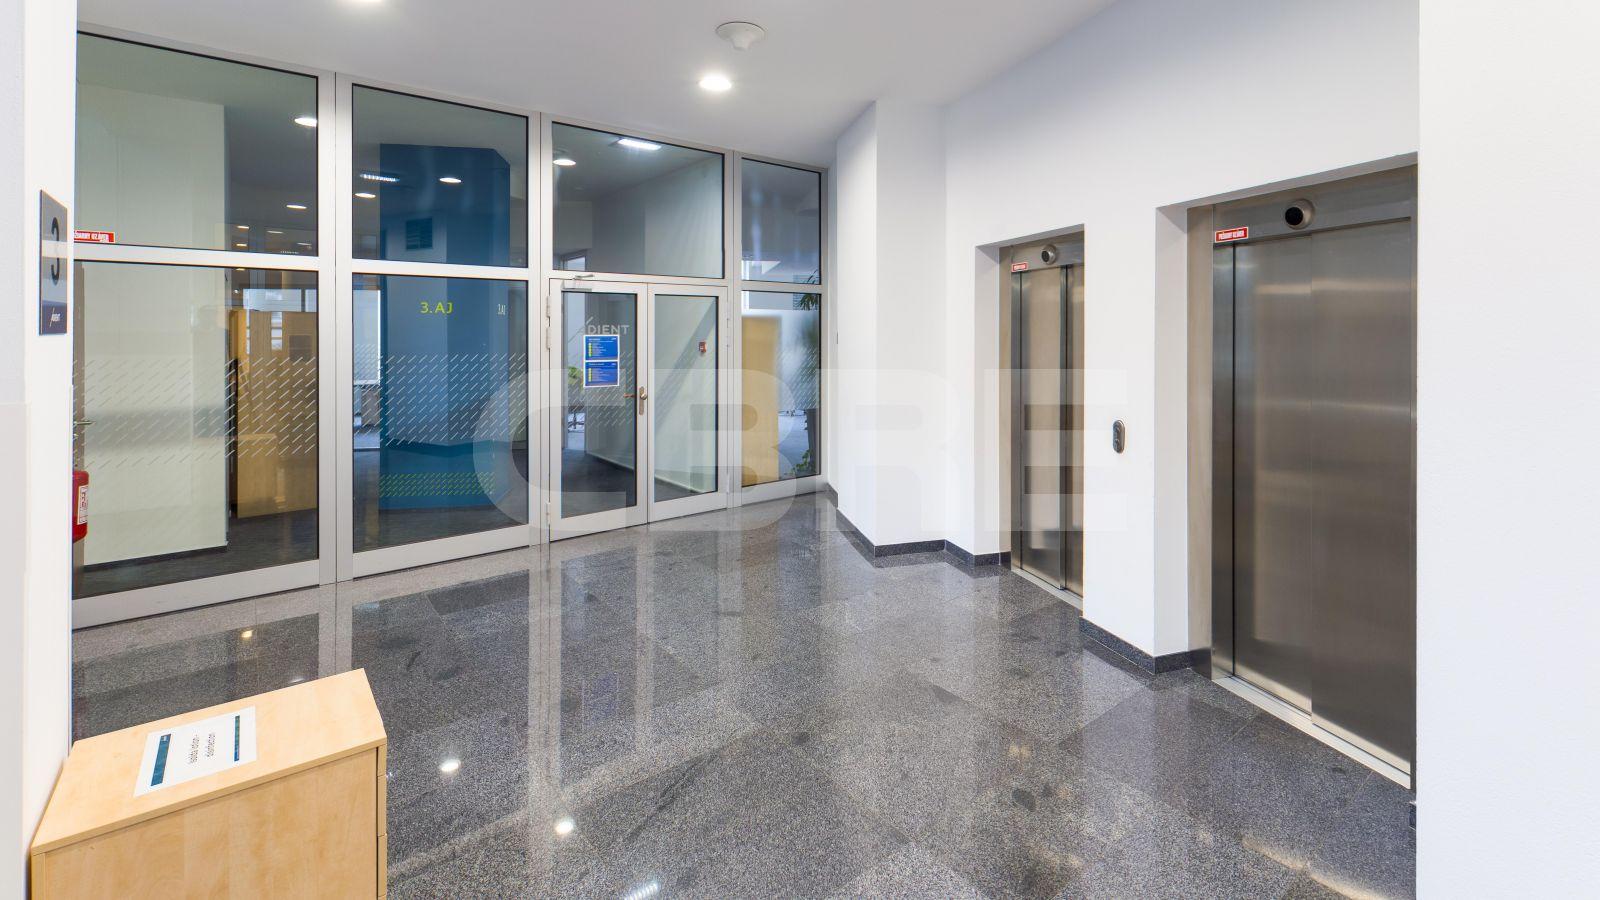 Pressburg Trade Center, Bratislava - Staré Mesto | Offices for rent by CBRE | 2